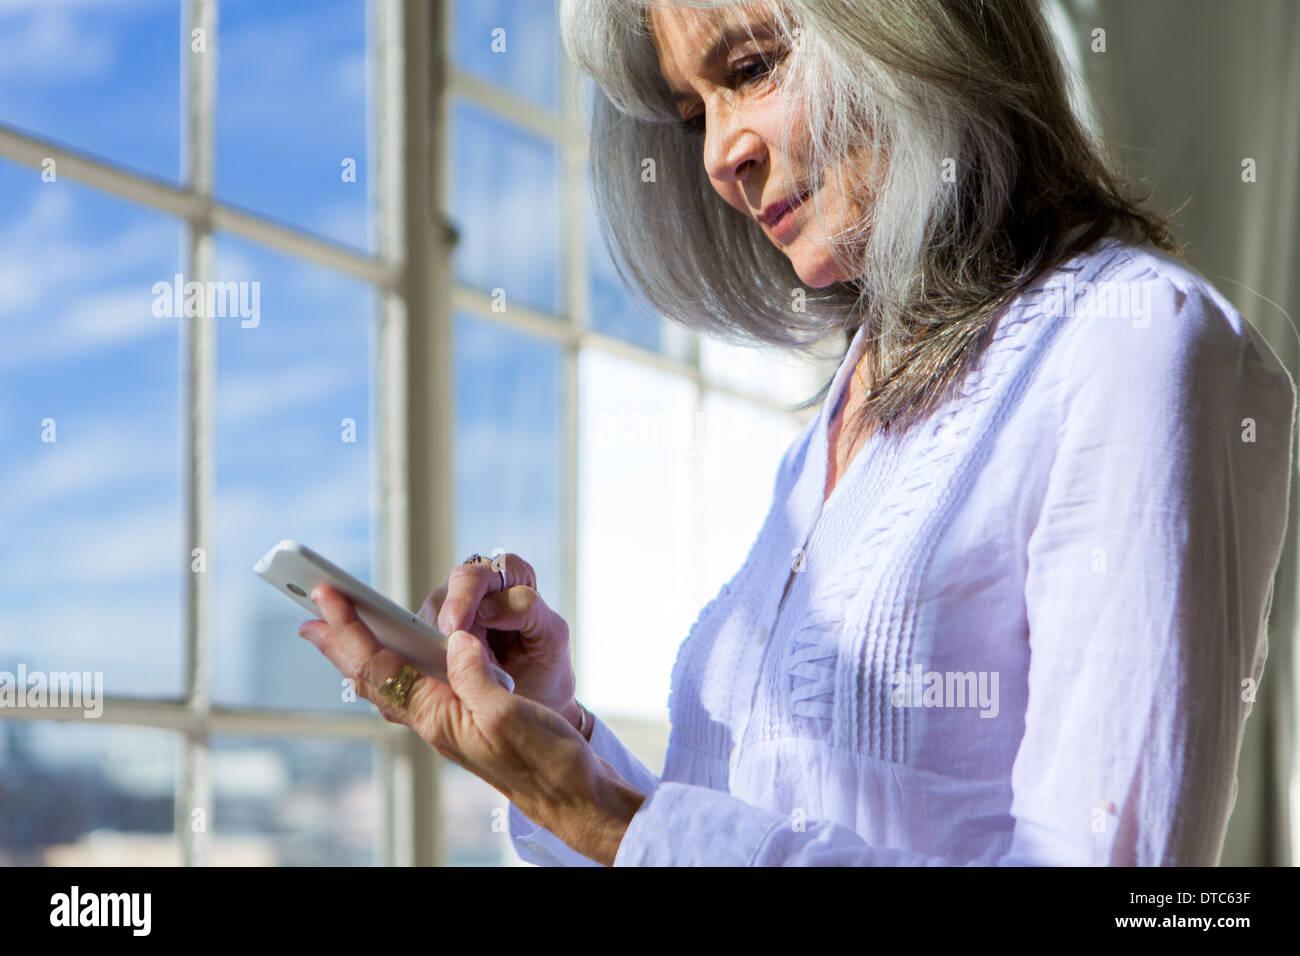 Senior woman using touchscreen on smartphone - Stock Image